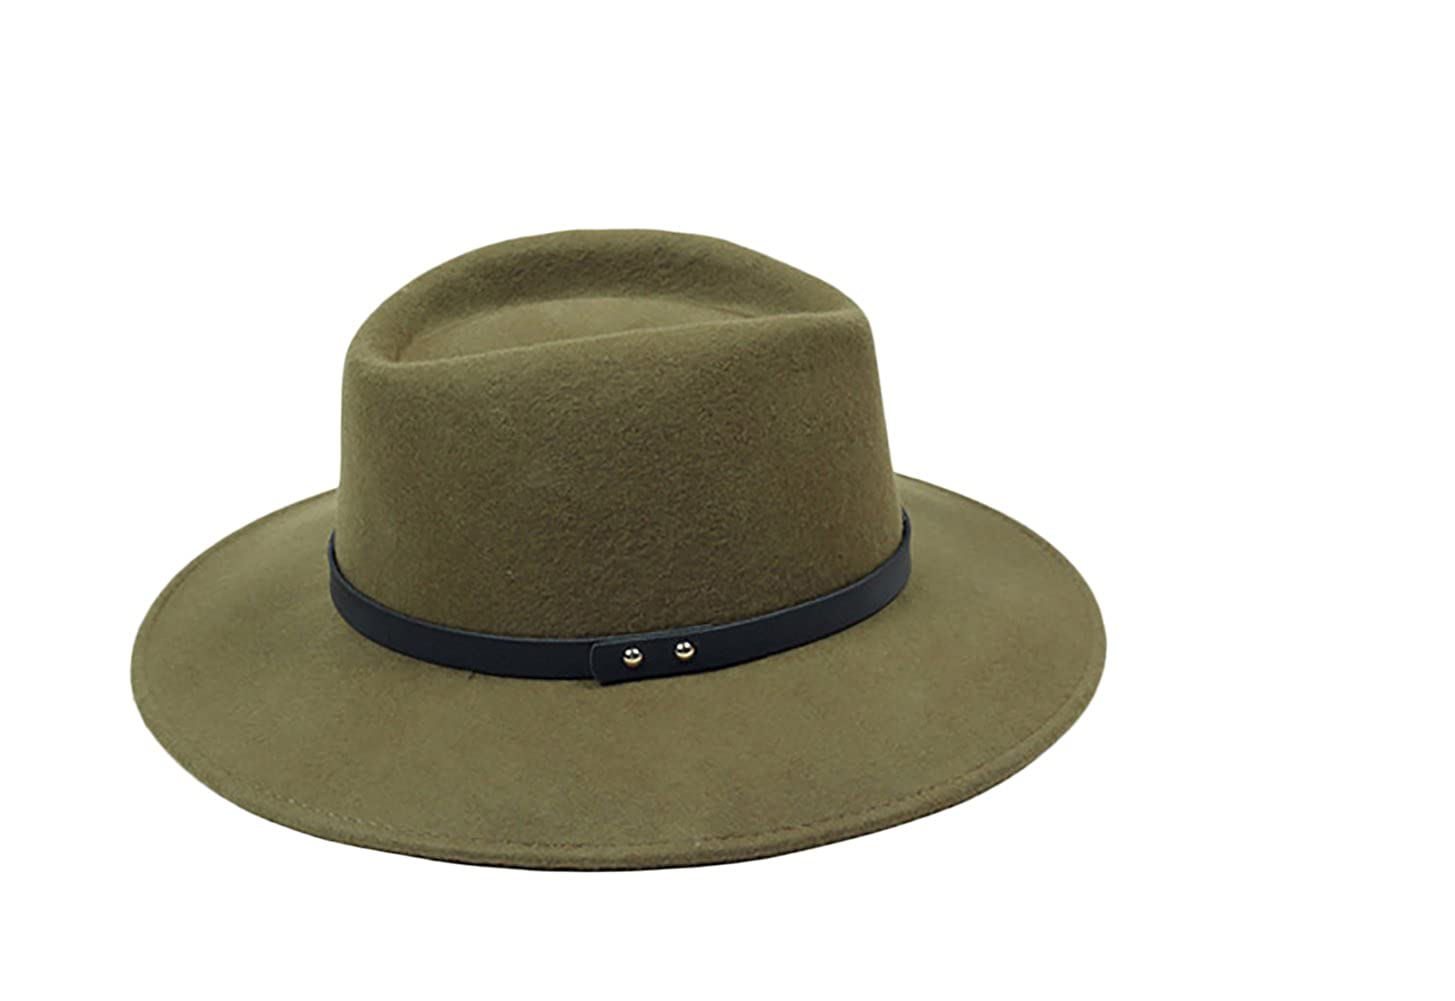 Liveinu Women s 100% Wool Felt Hat Wide Brim Floppy Fedora Hat Jazz Hats  With Belt Green at Amazon Women s Clothing store  325315a038d6